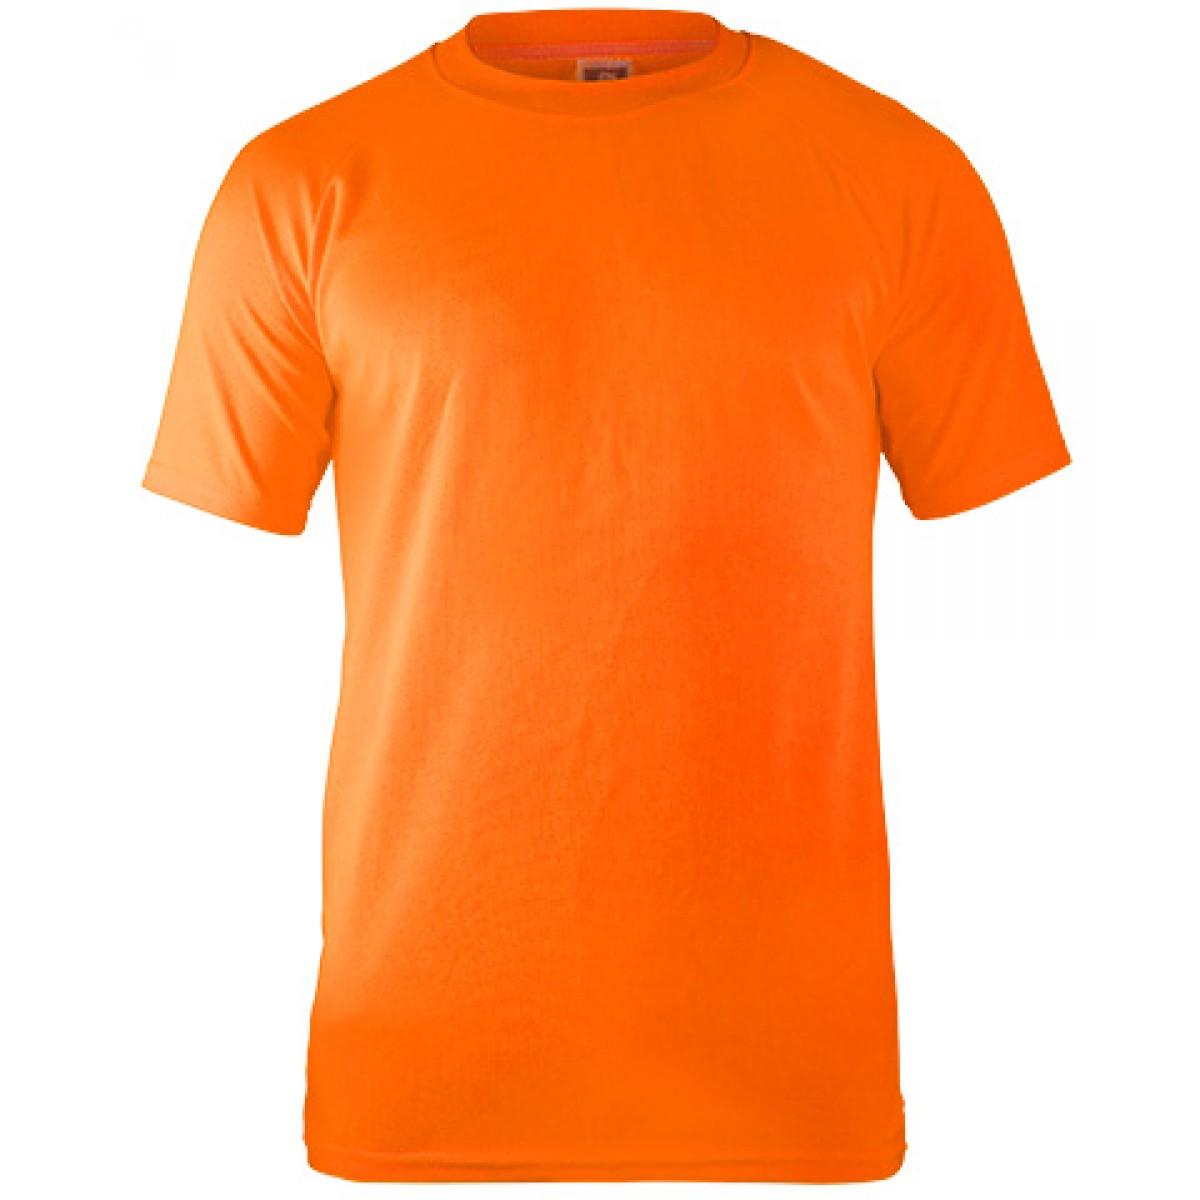 Performance T-shirt-Safety Orange-2XL